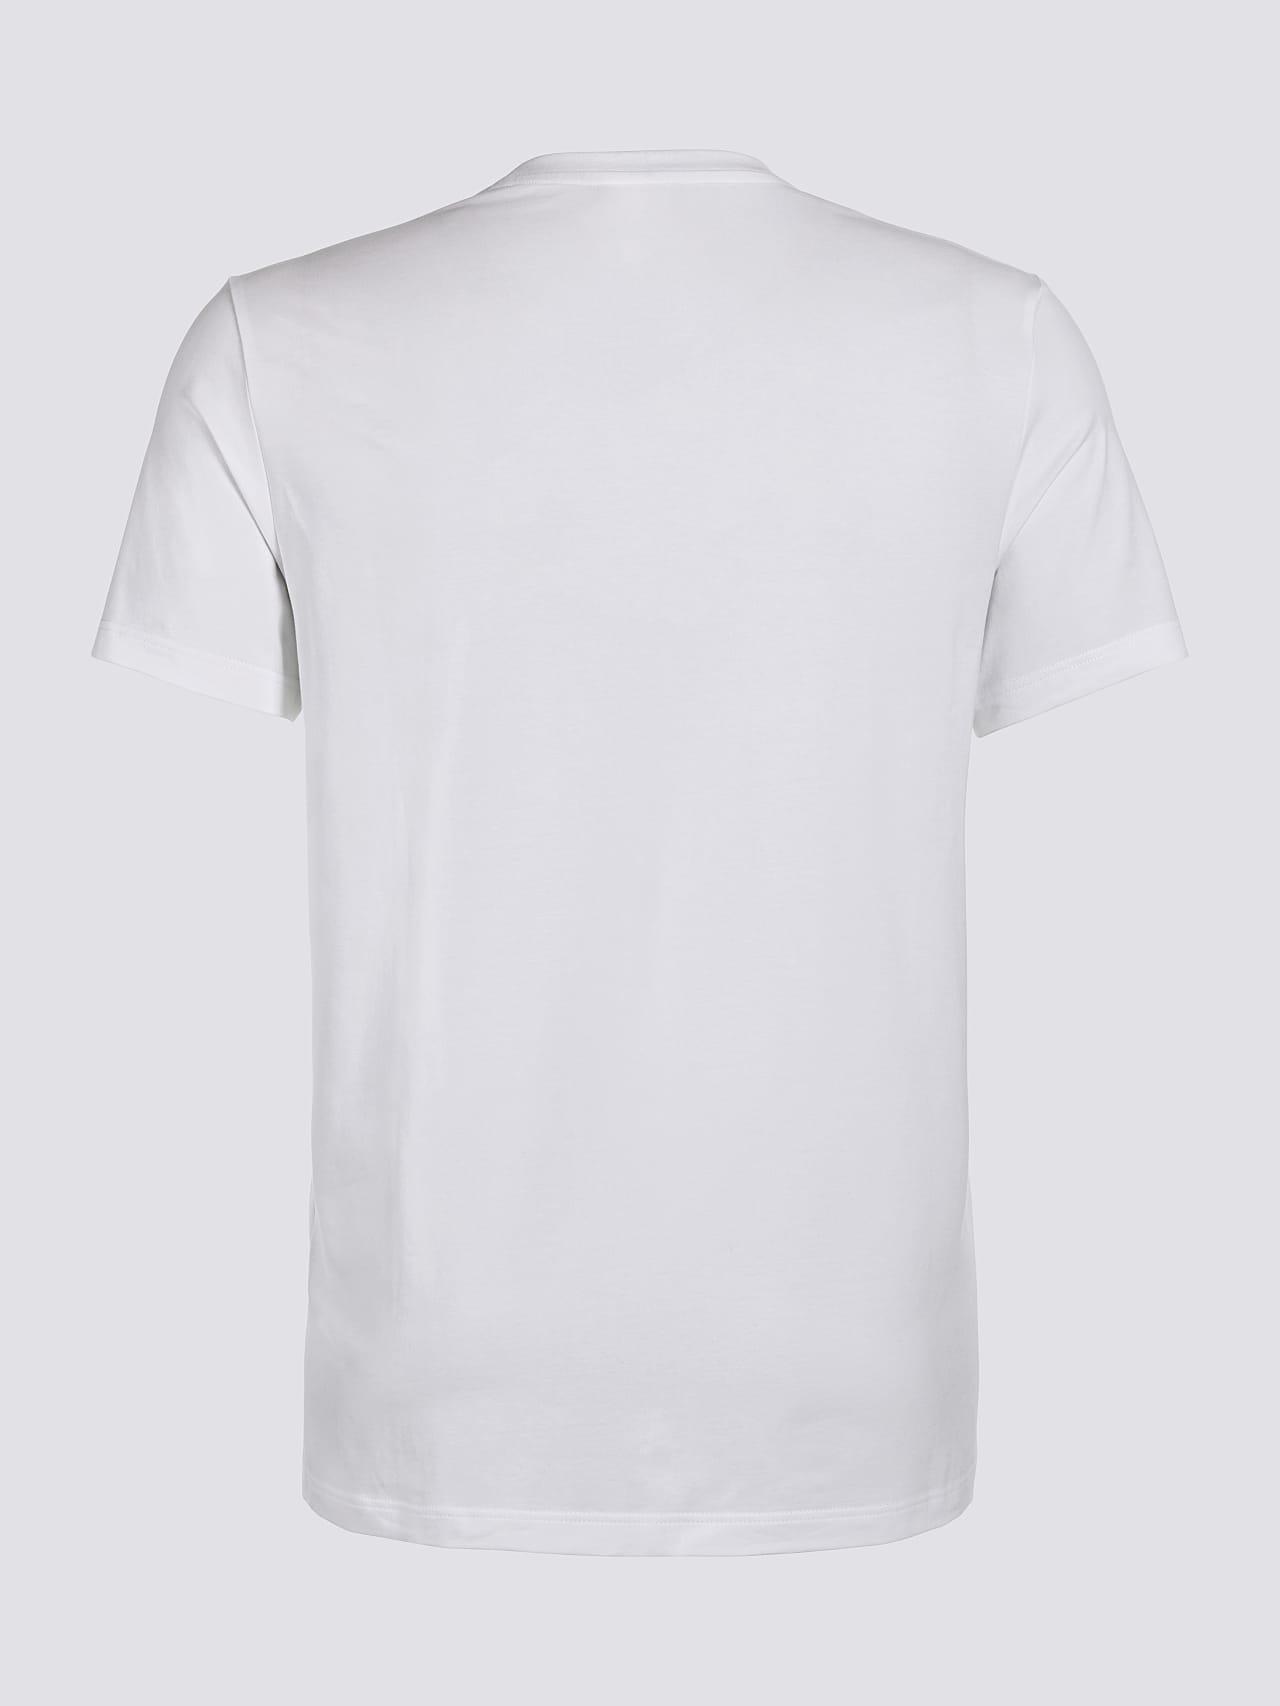 JERO V2.Y4.02 Signature Logo T-Shirt white Left Alpha Tauri